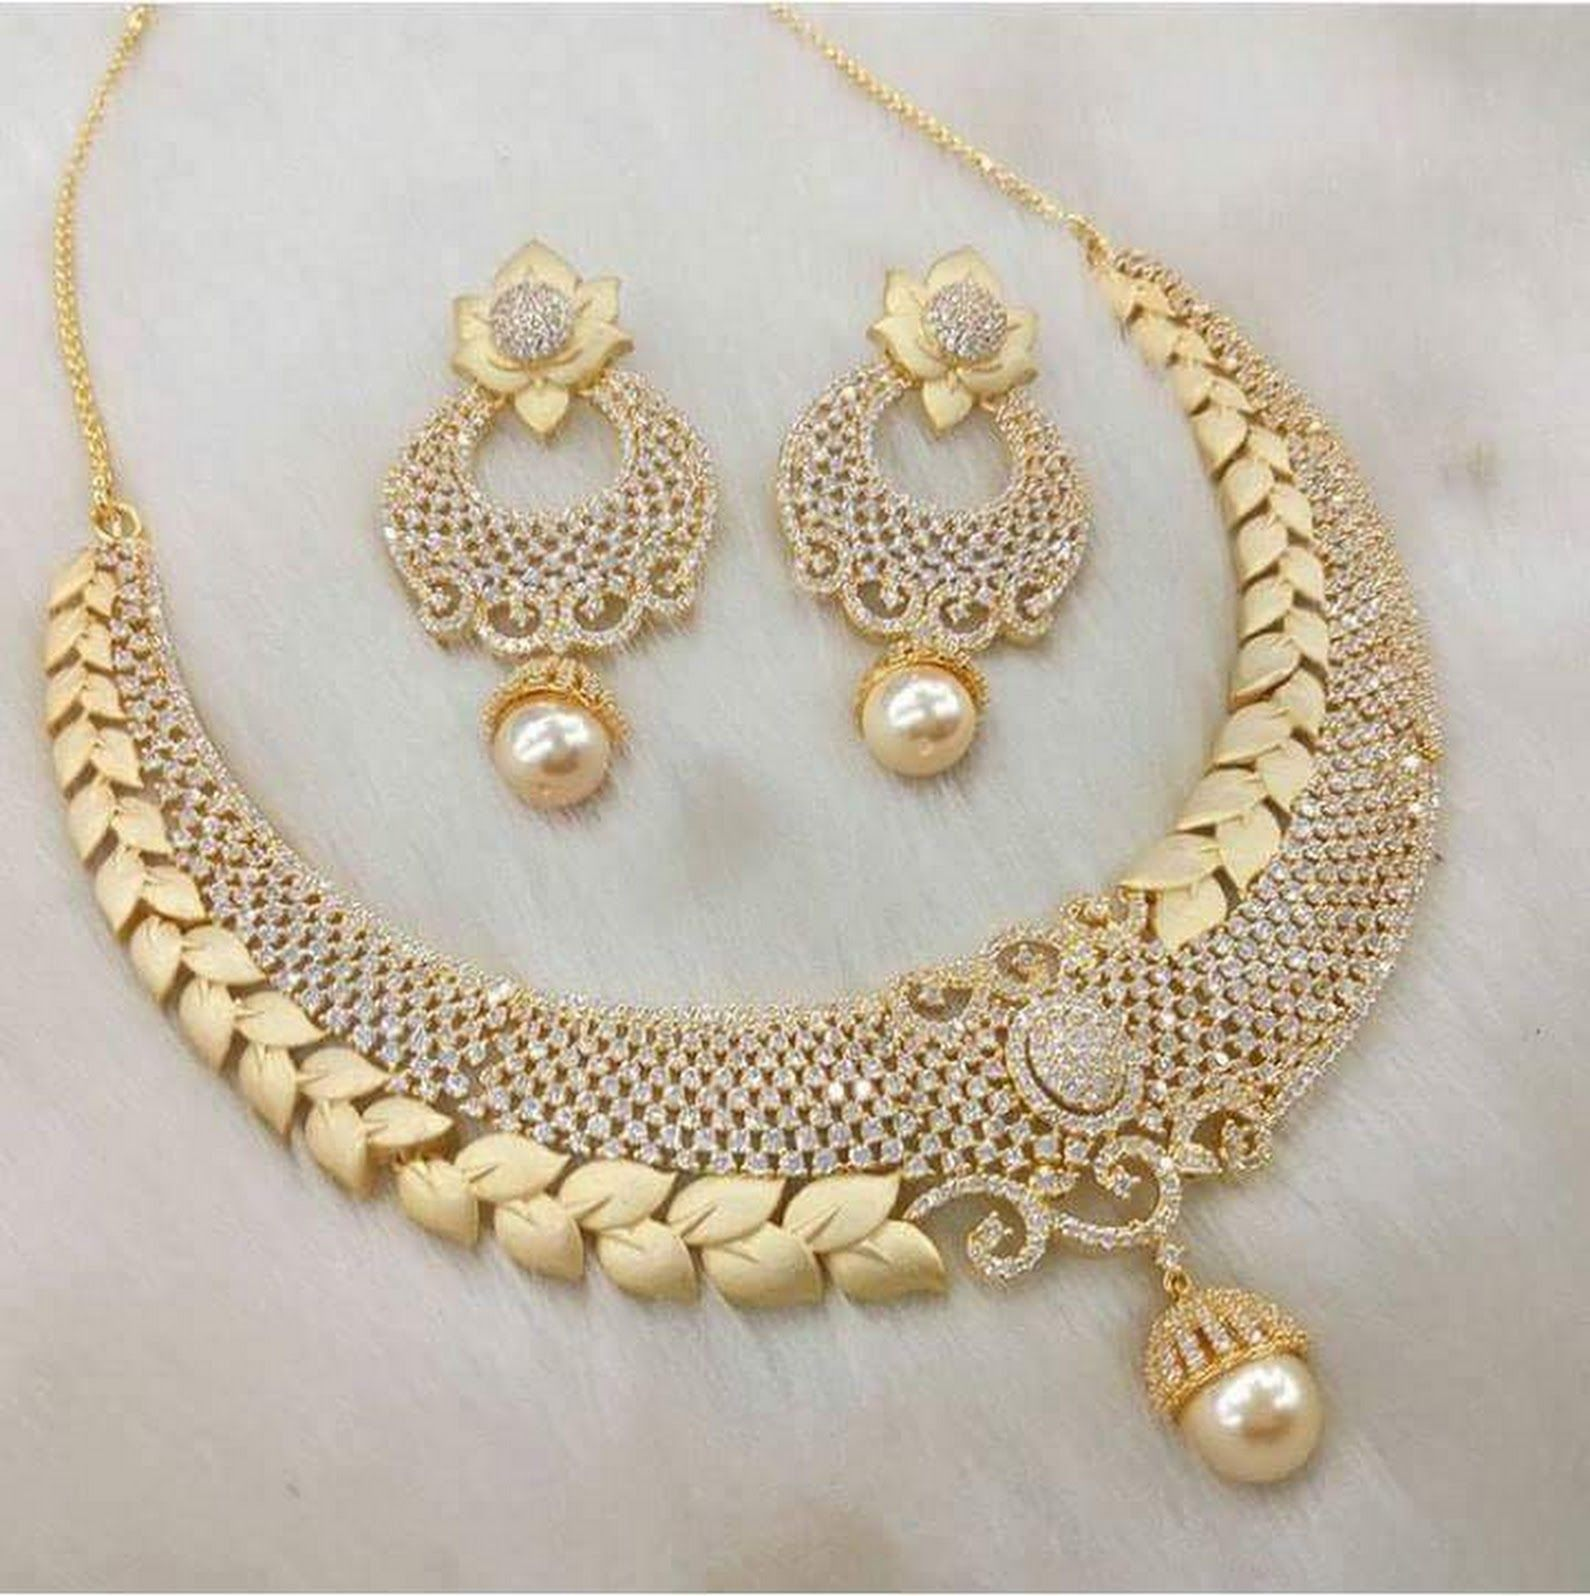 Pin by kimmoun govender on my wedding pinterest luxury india